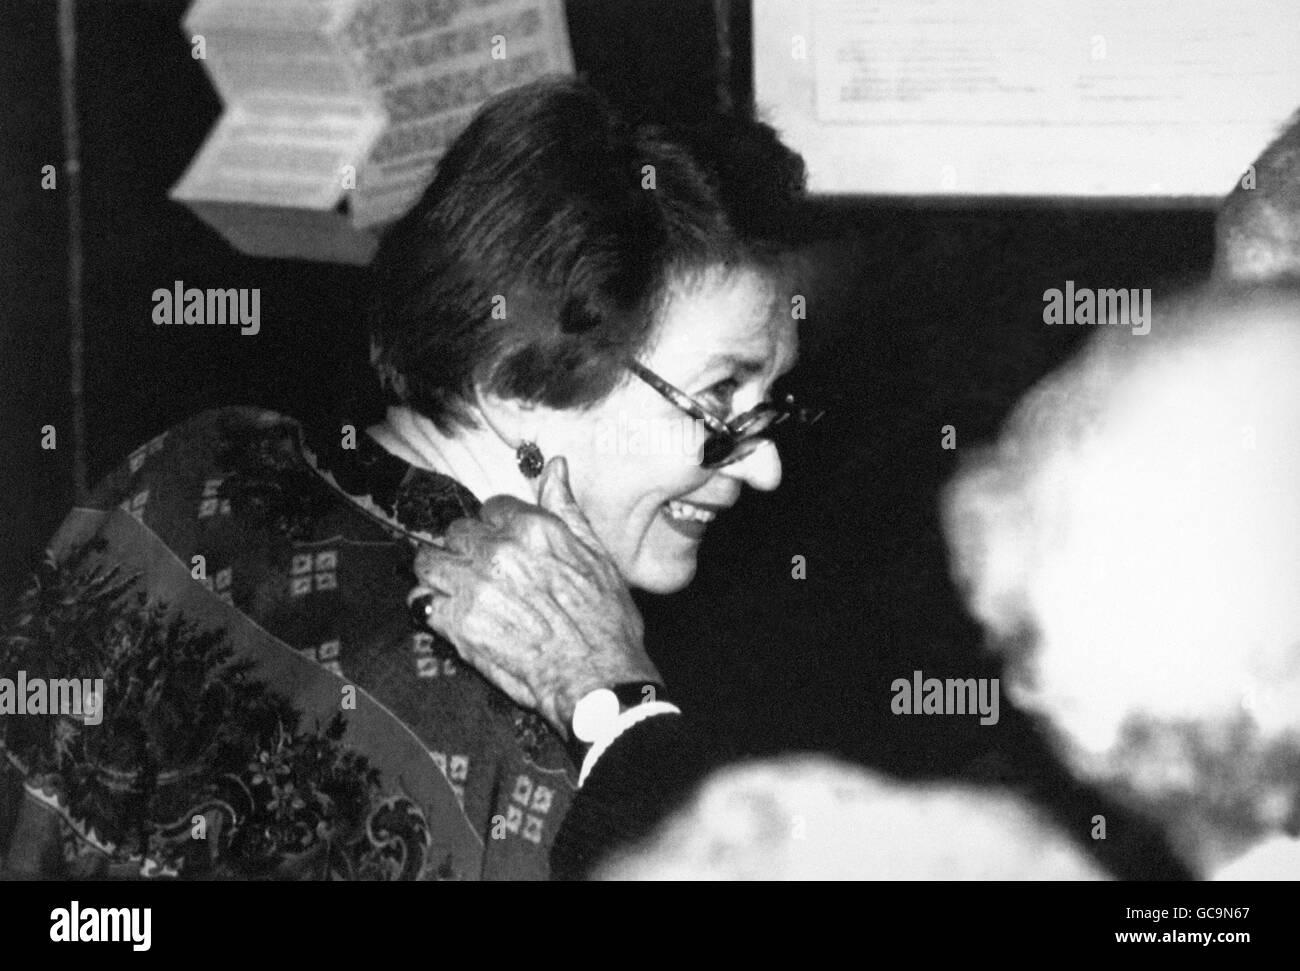 RUFINA PHILBY - KIM'S AUCTION - Stock Image